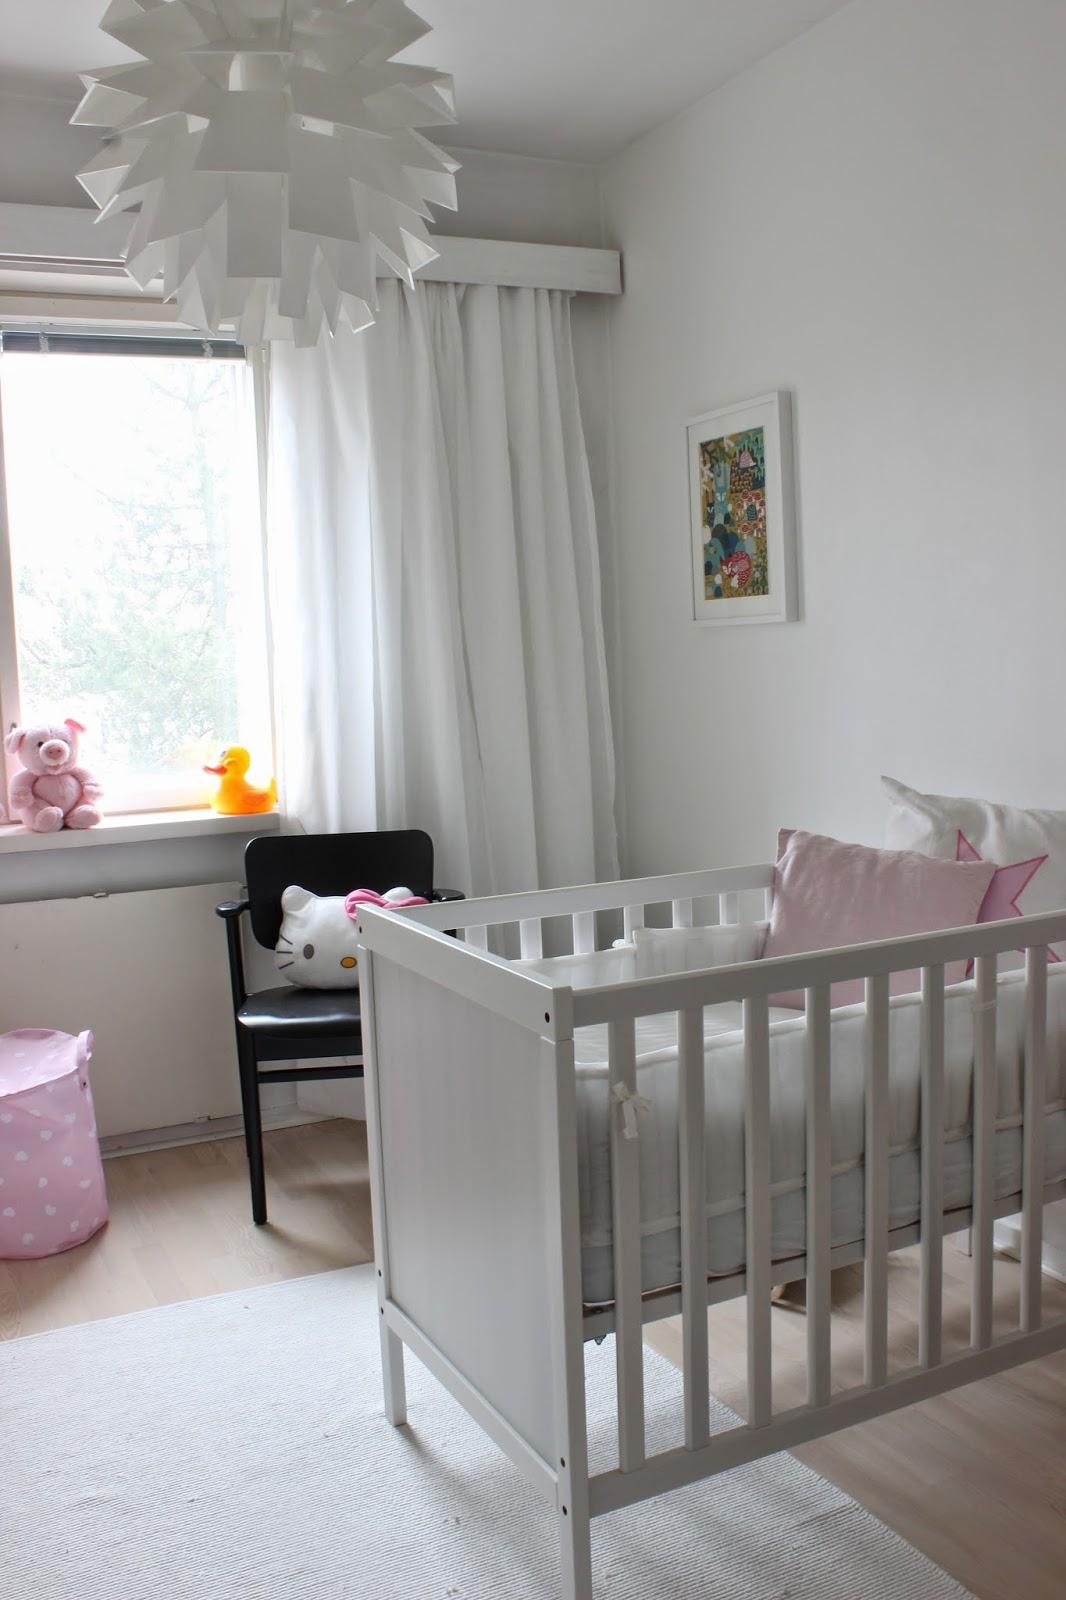 JOUKOLATAR vauvanhuoneen verhot